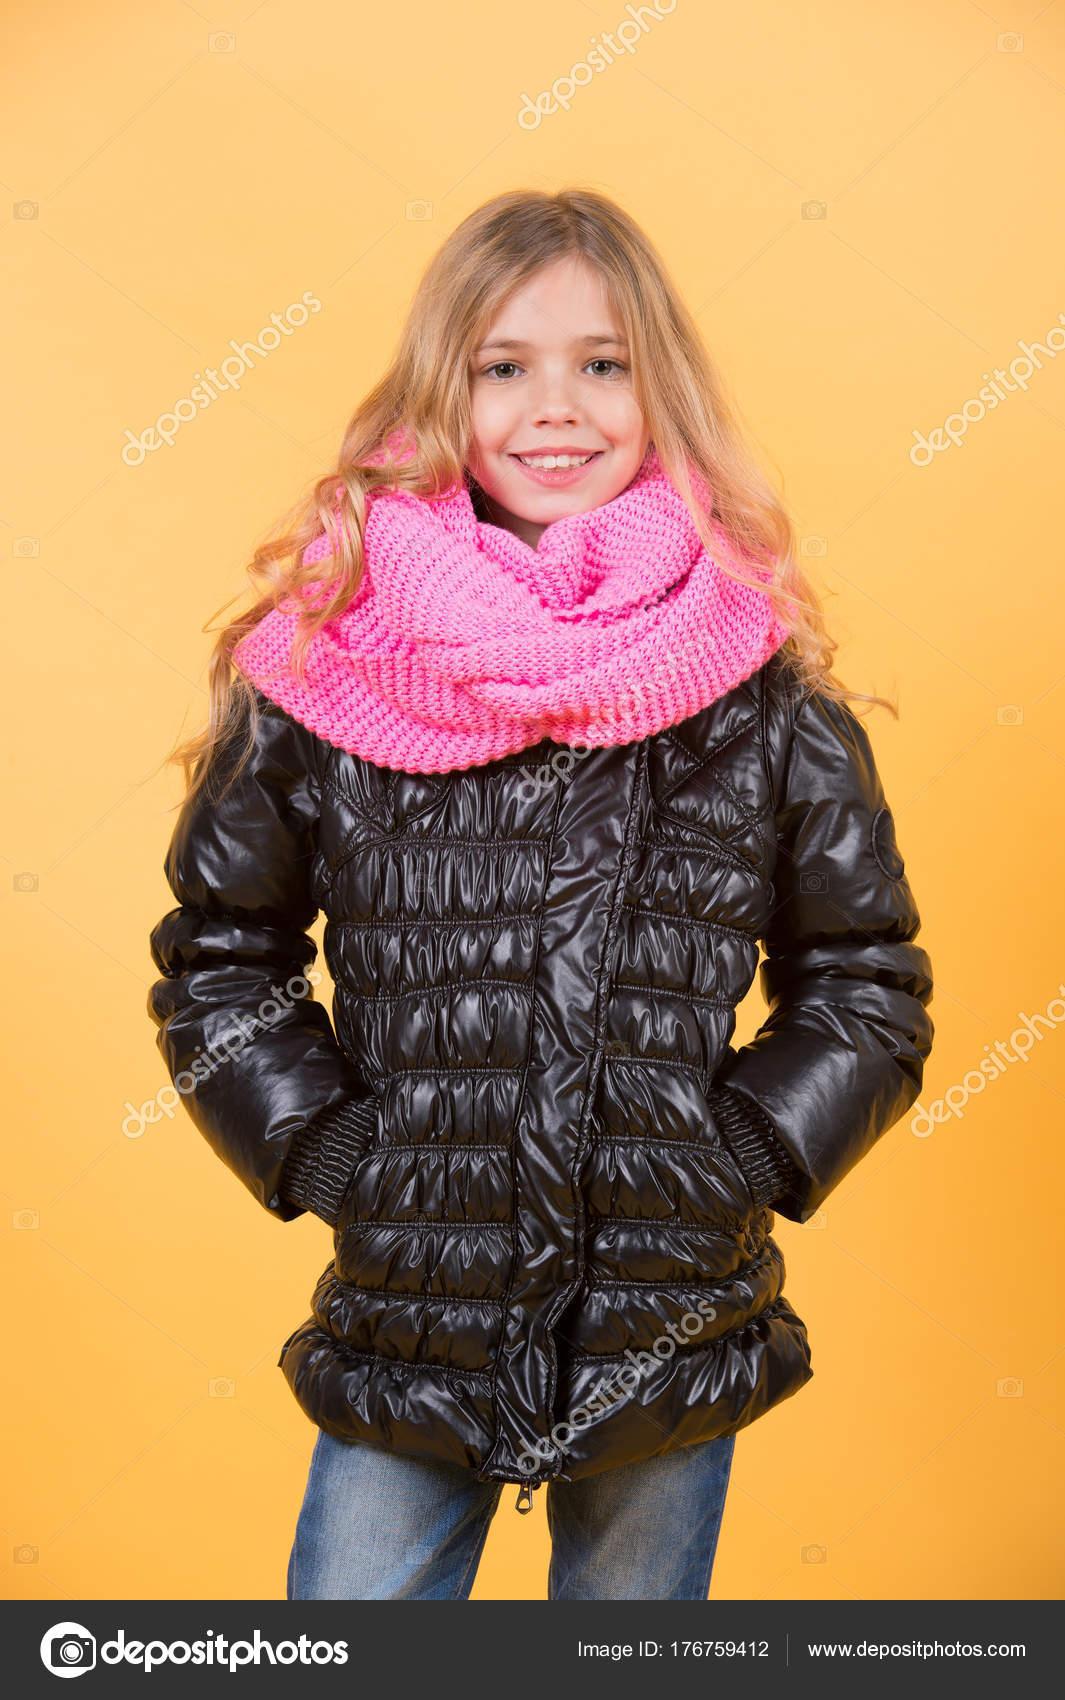 00059e6fced Κορίτσι σε μαύρο παλτό και ροζ φουλάρι σε πορτοκαλί φόντο. Παιδί ομορφιά,  κοιτάξτε, χτένισμα. Φθινοπωρινή μόδα, το στυλ, η τάση. Έννοια ευτυχισμένη  παιδική ...